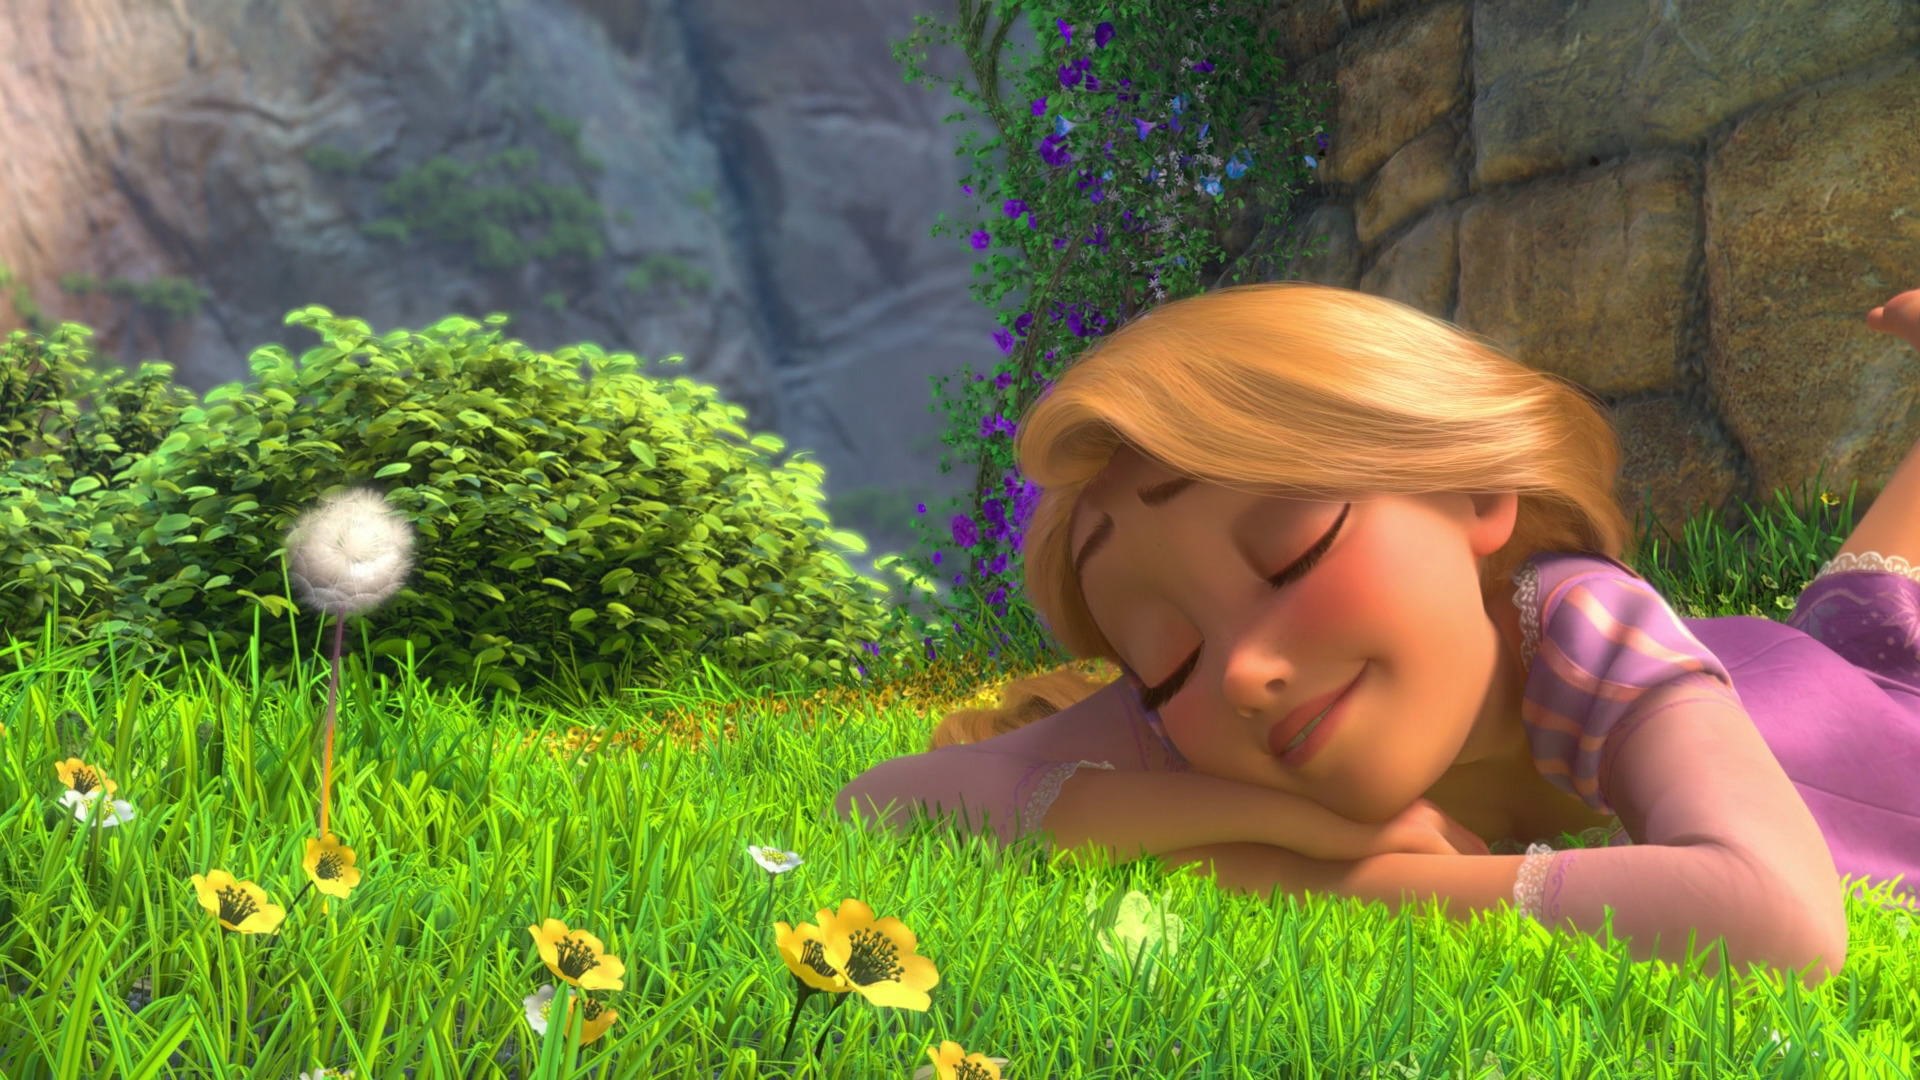 rapunzel of disney princesses images rapunzel - my life begin hd